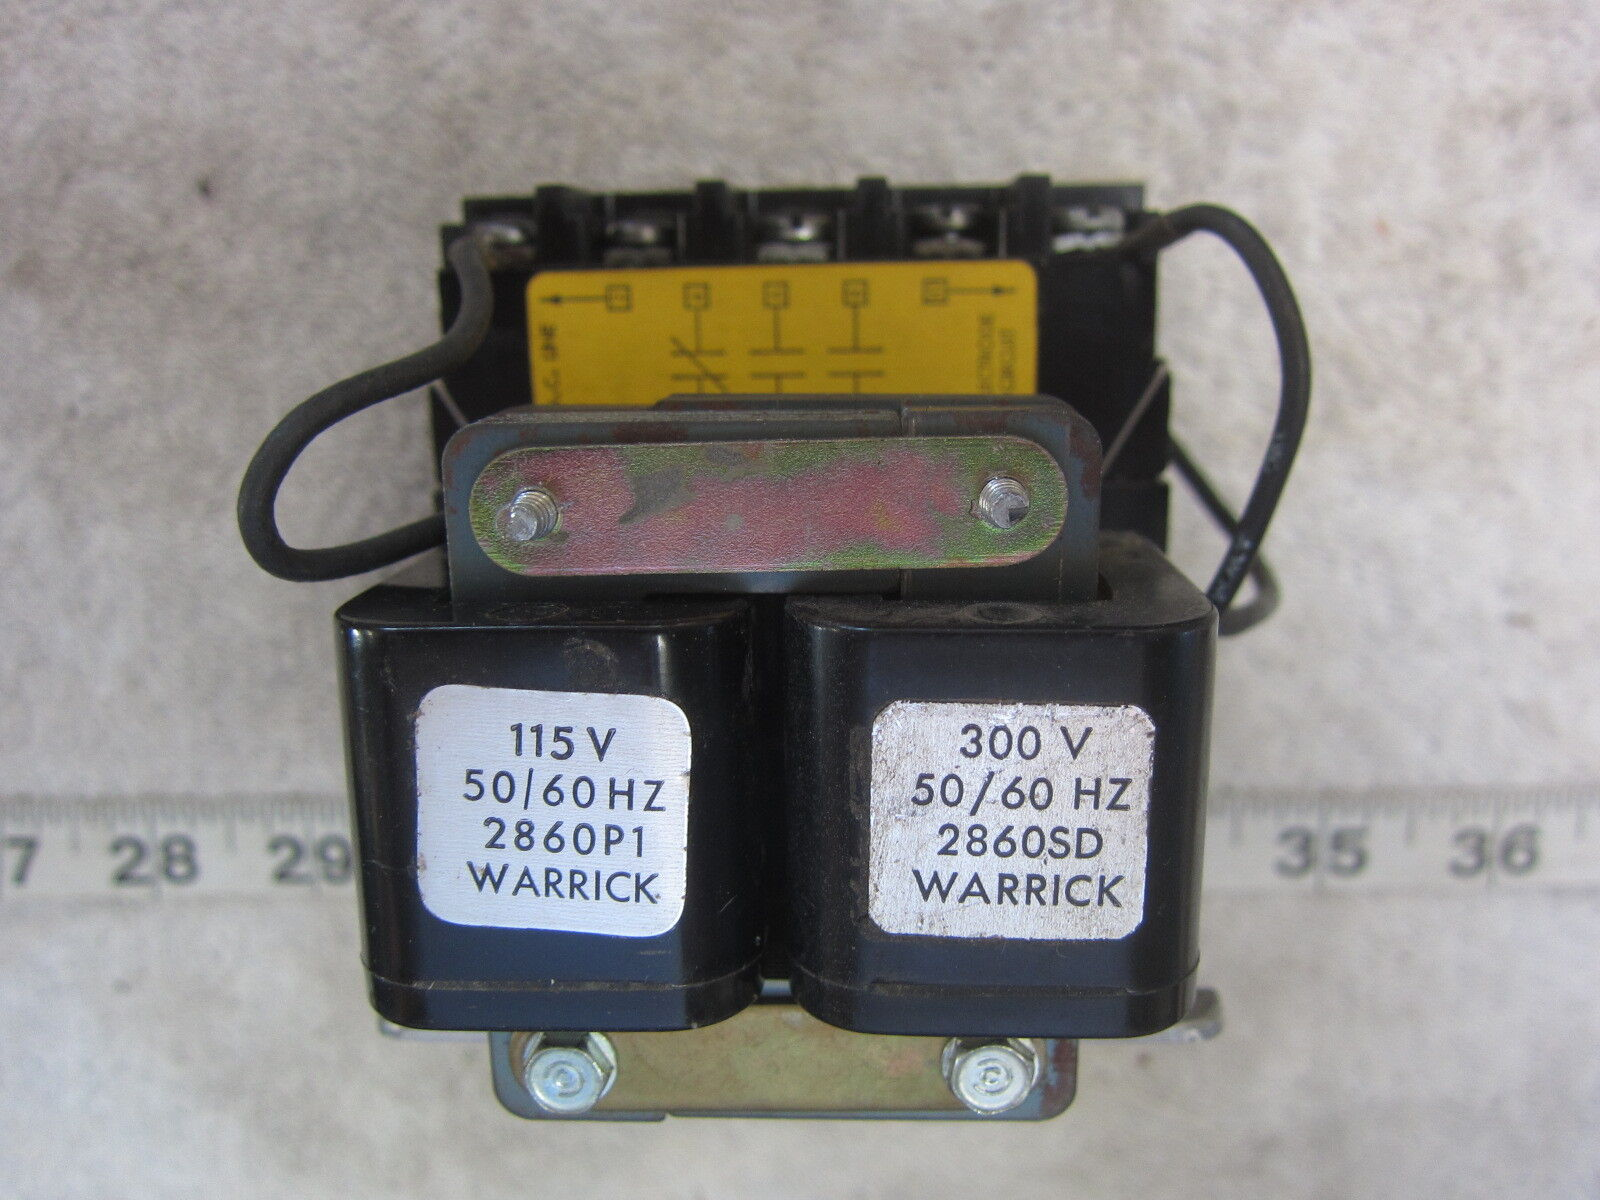 WARRICK CONTROLS 2860SD